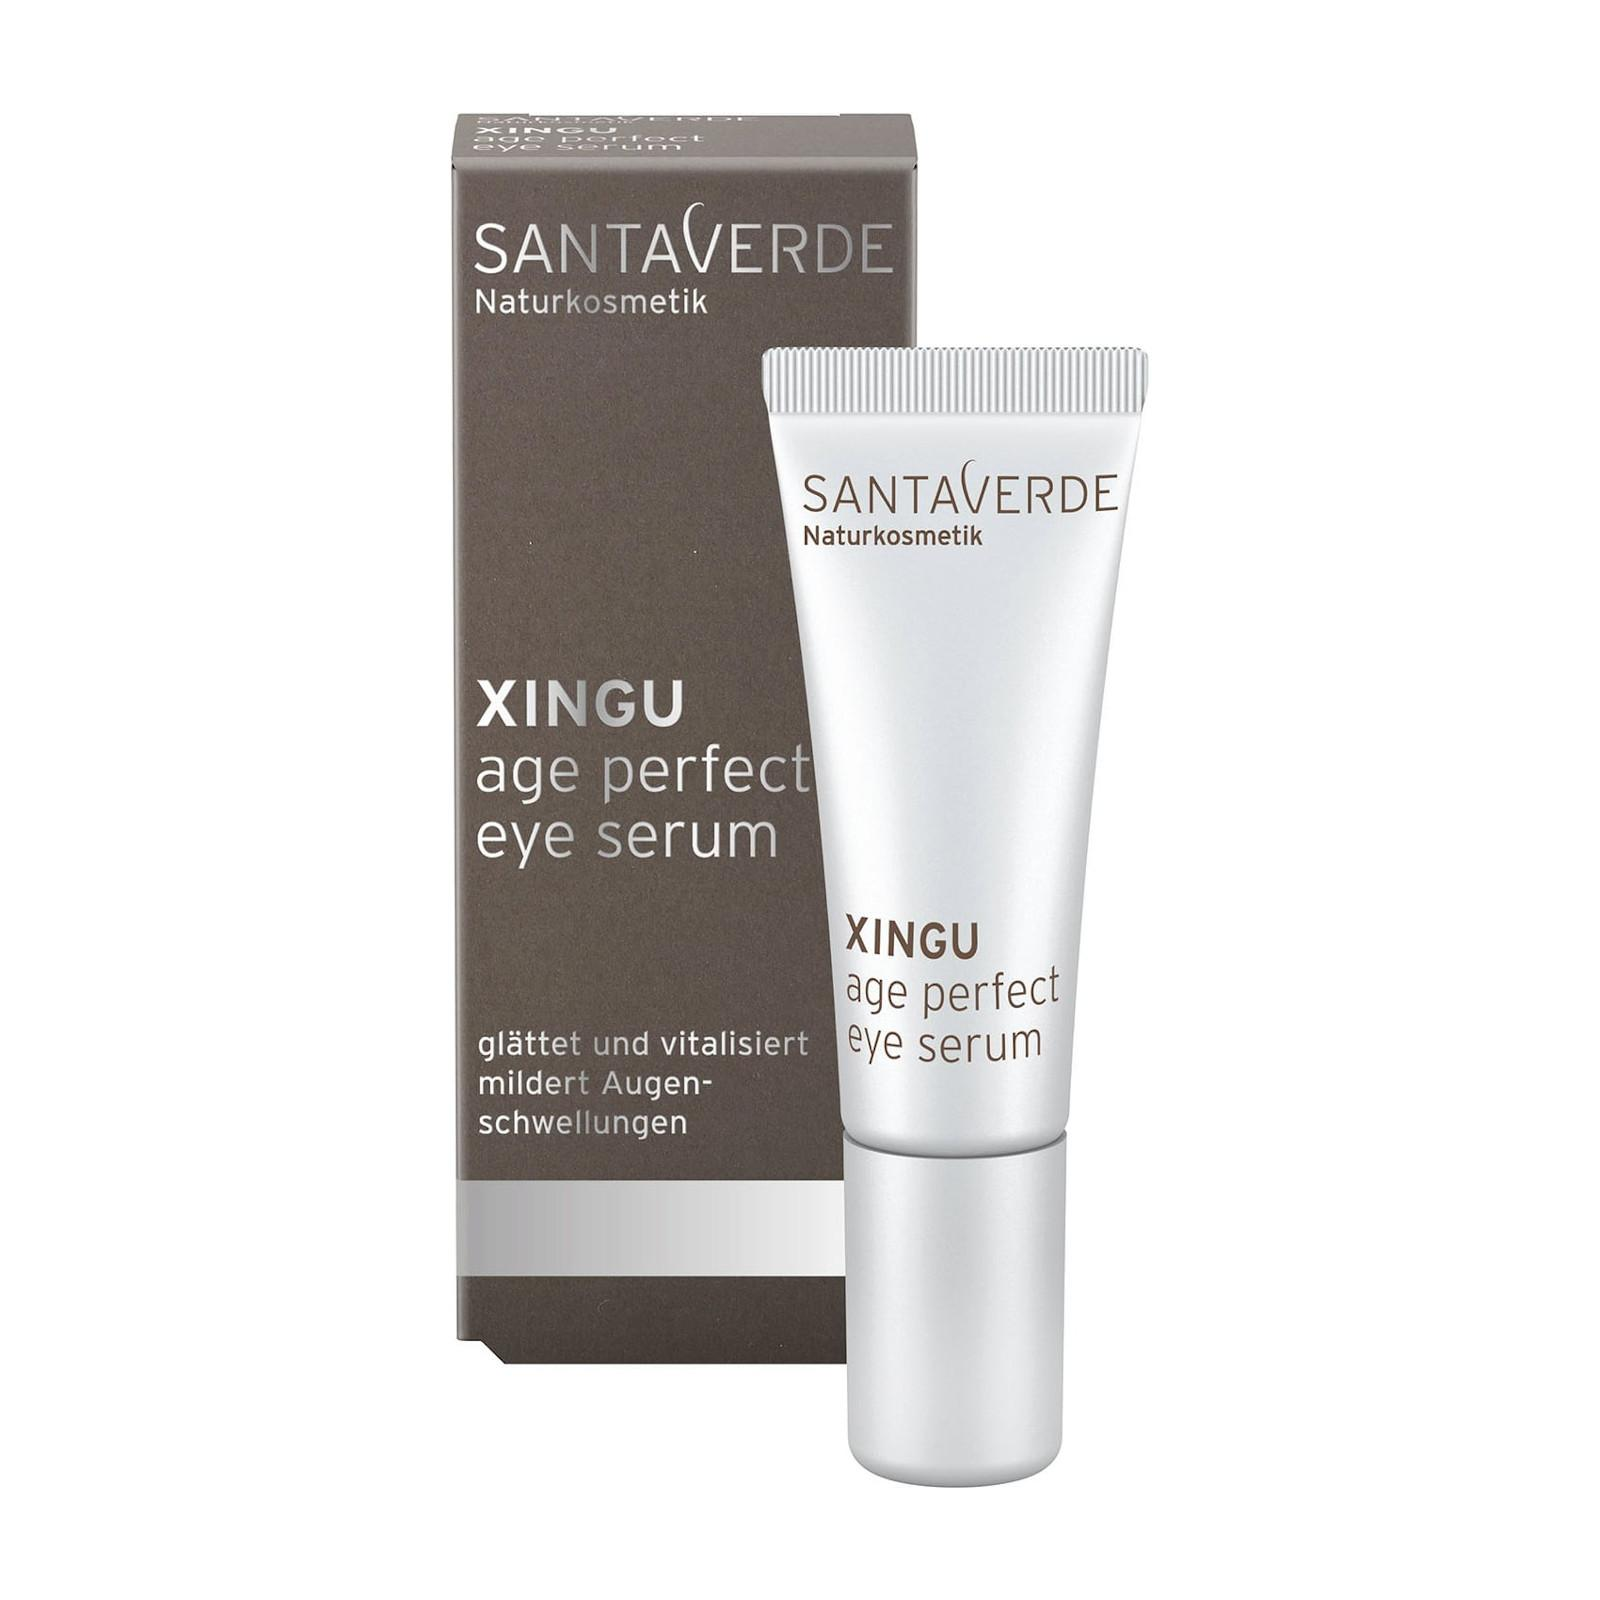 Santaverde Oční sérum Xingu, special anti-age care 10 ml